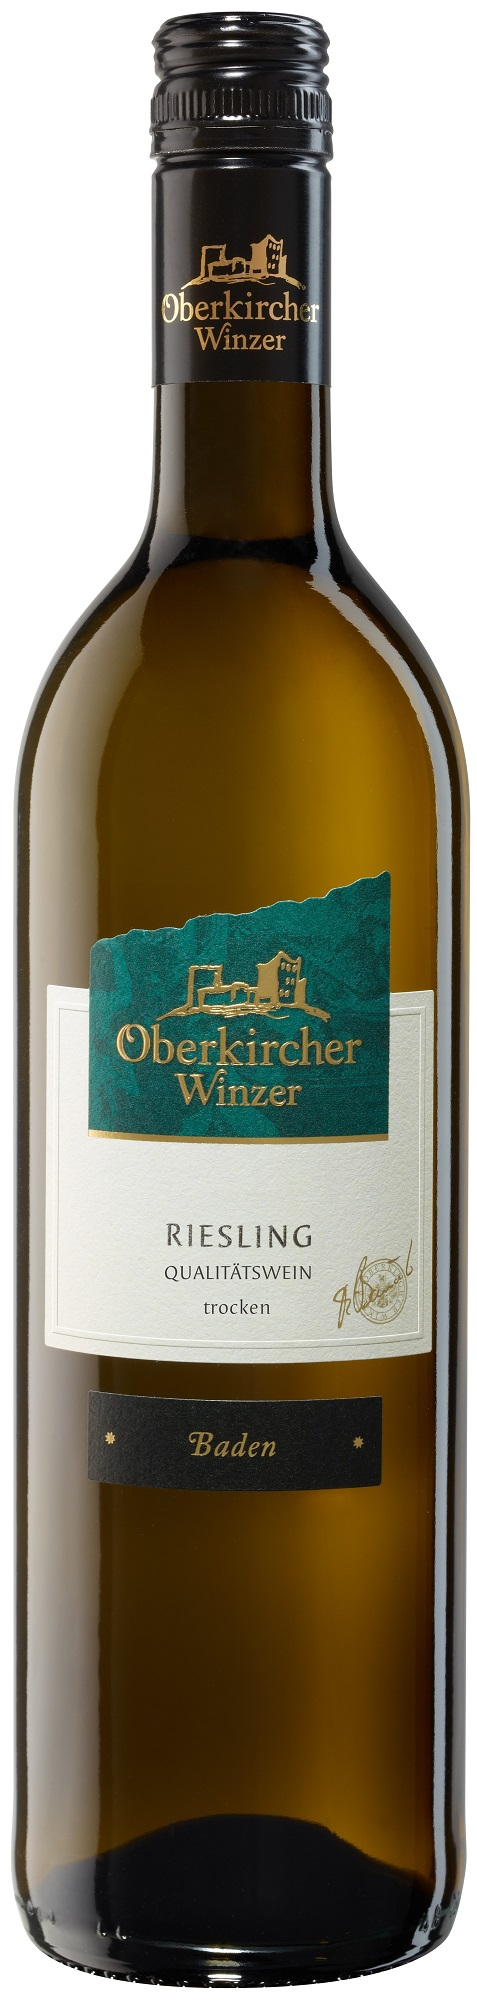 Collection Oberkirch, Riesling Qualitätswein trocken